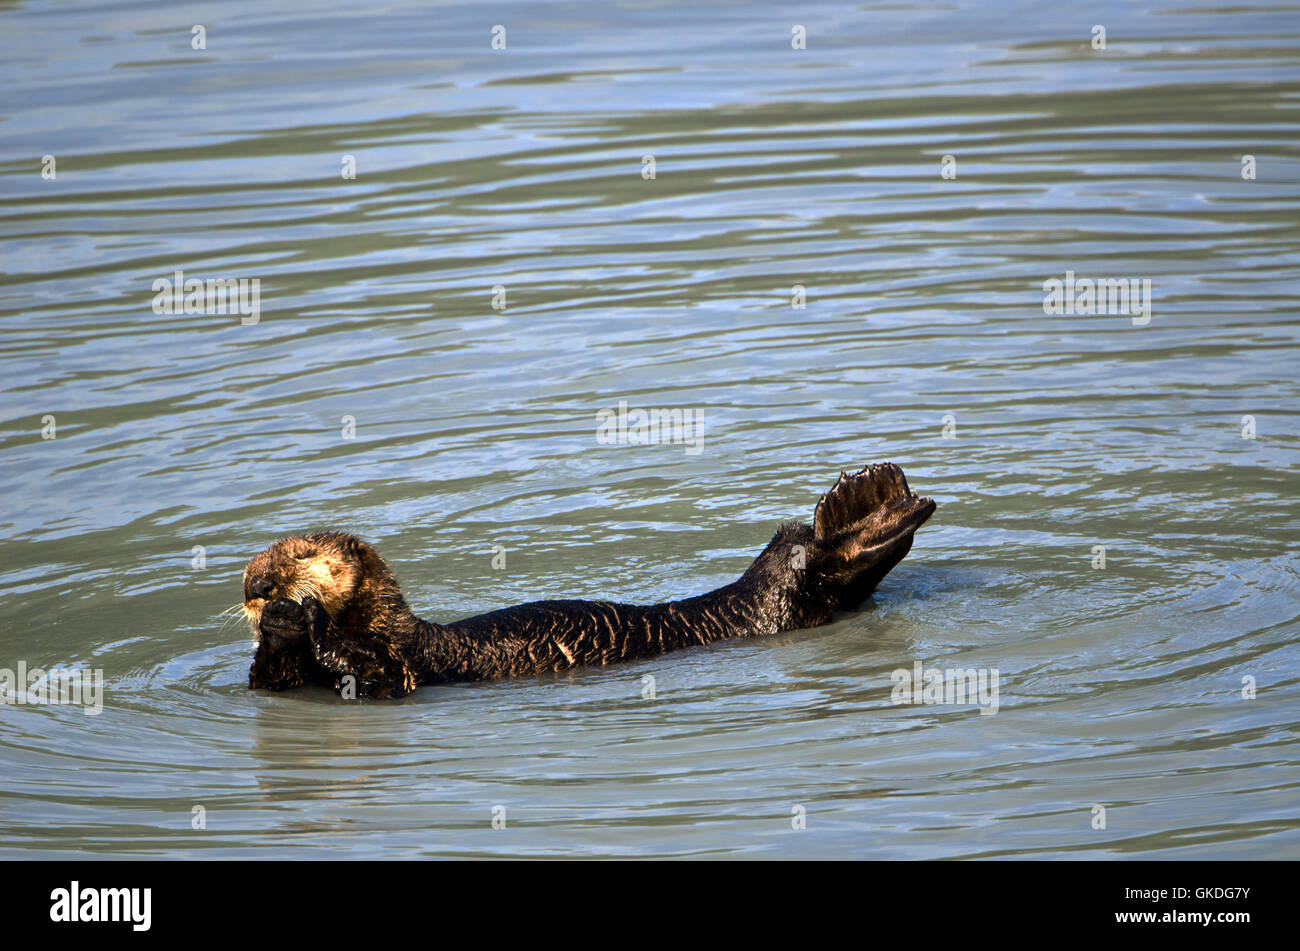 Seaotter swimming (Enhydra lutris) Resurrection Bay. Alaska Stock Photo